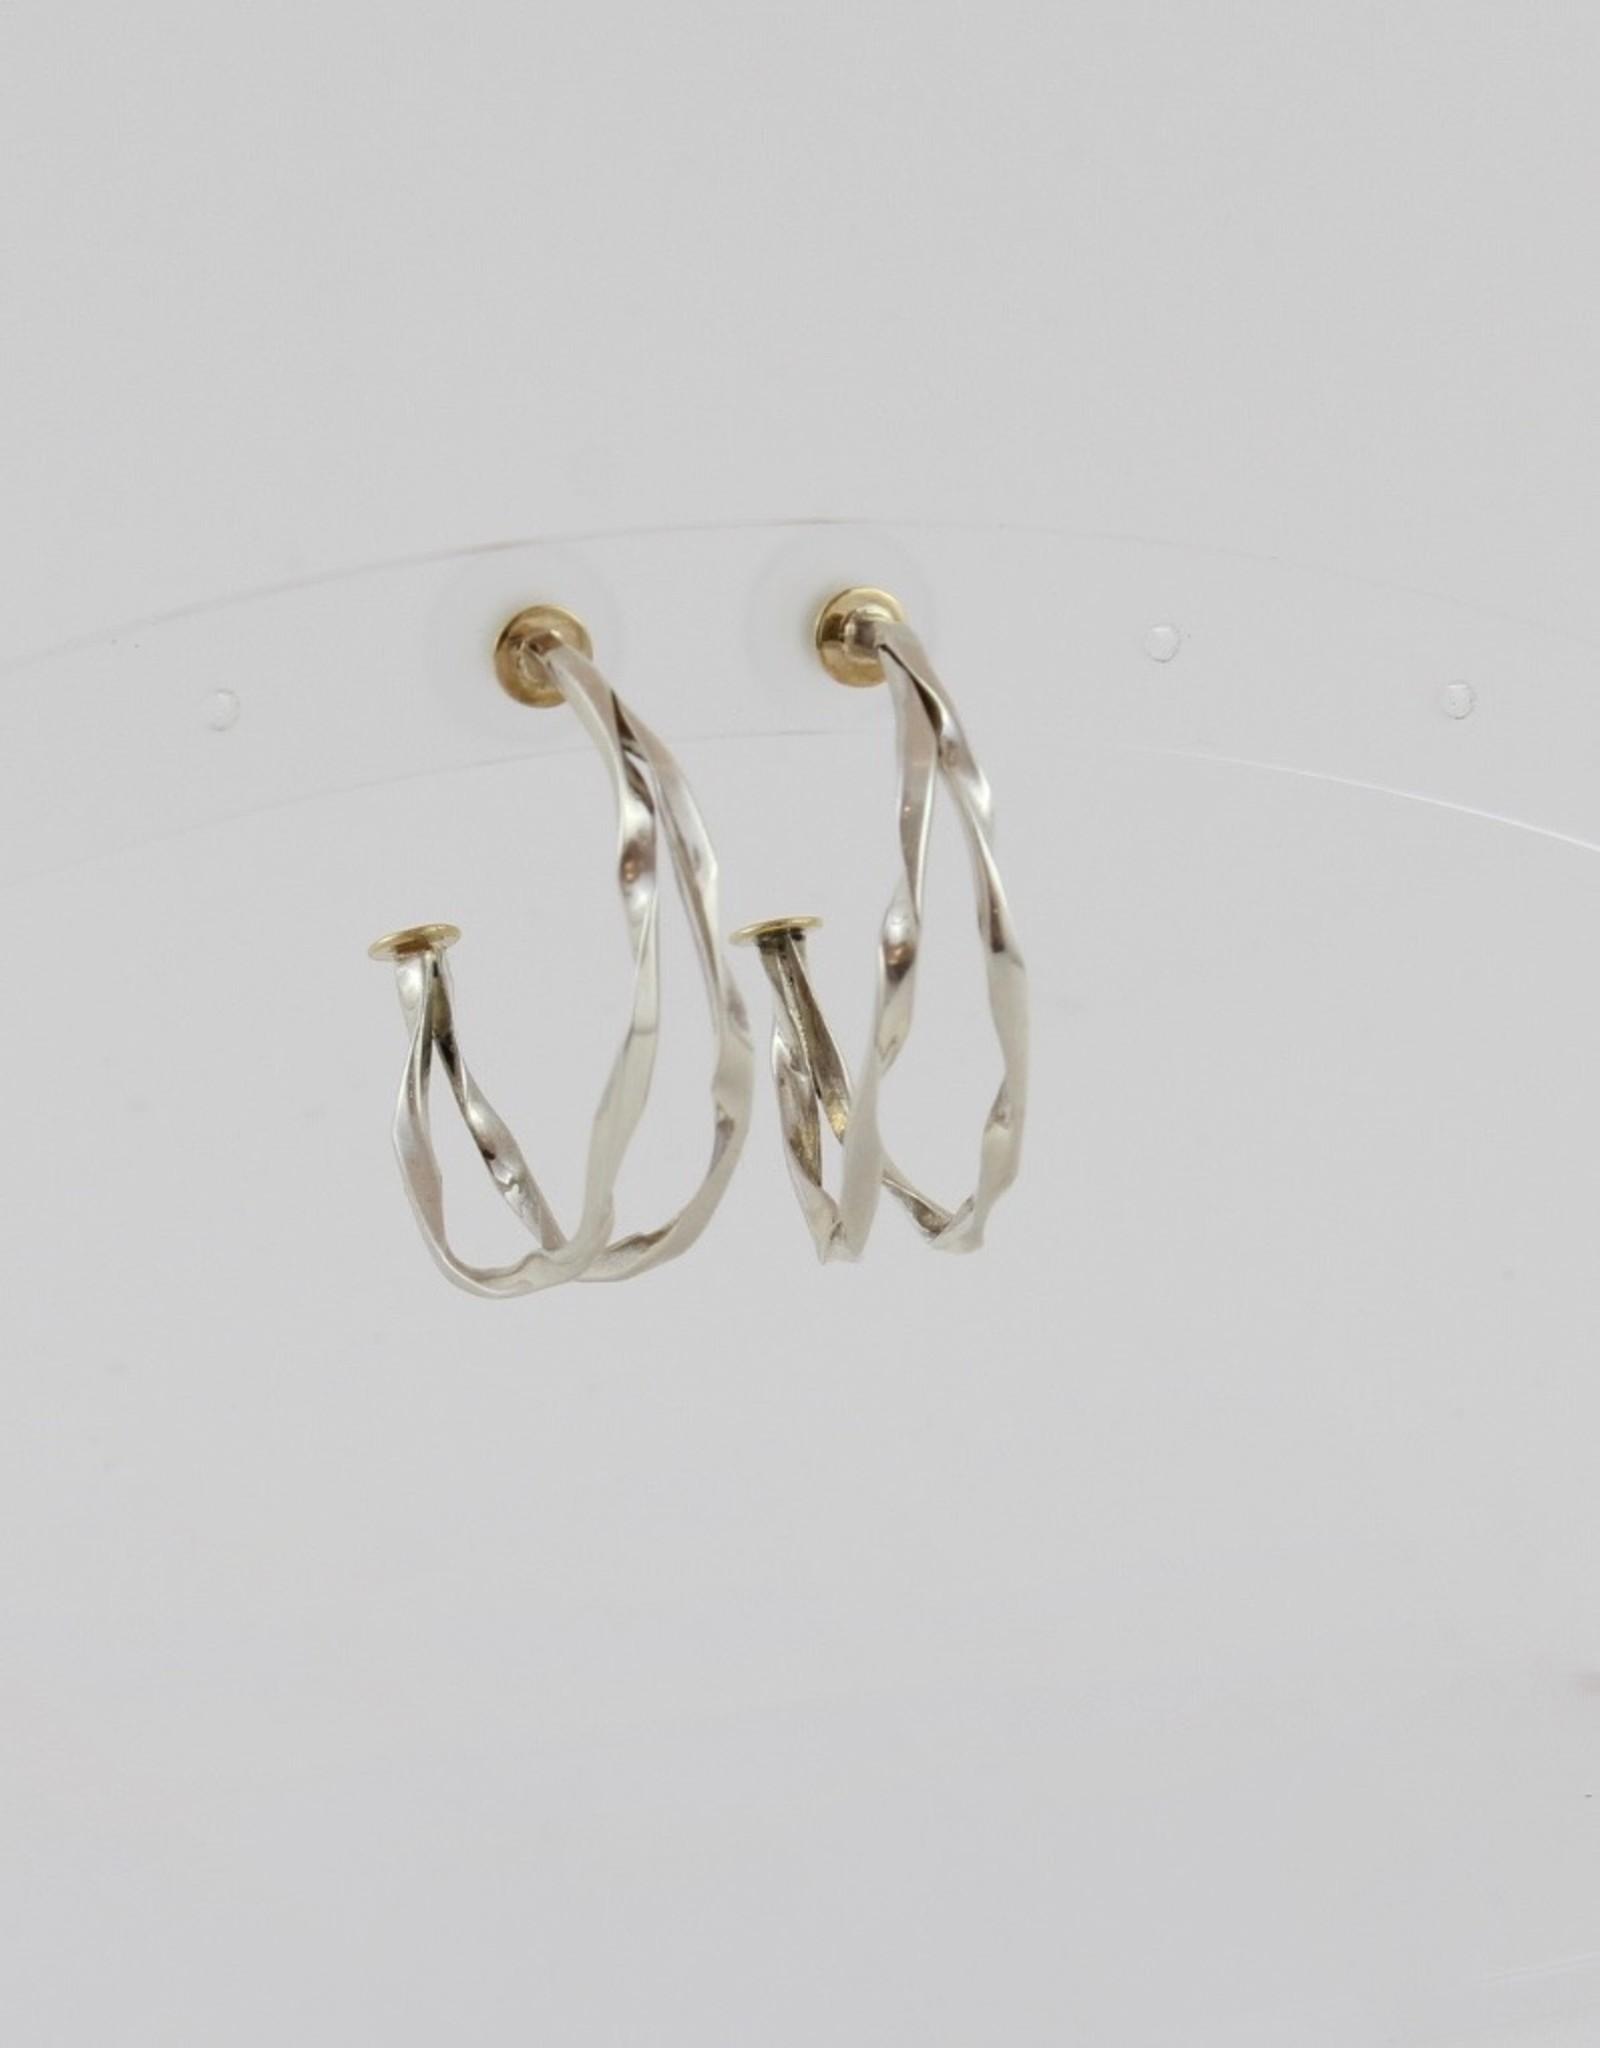 Karen Wawer Twisted Hoops by Karen Wawer